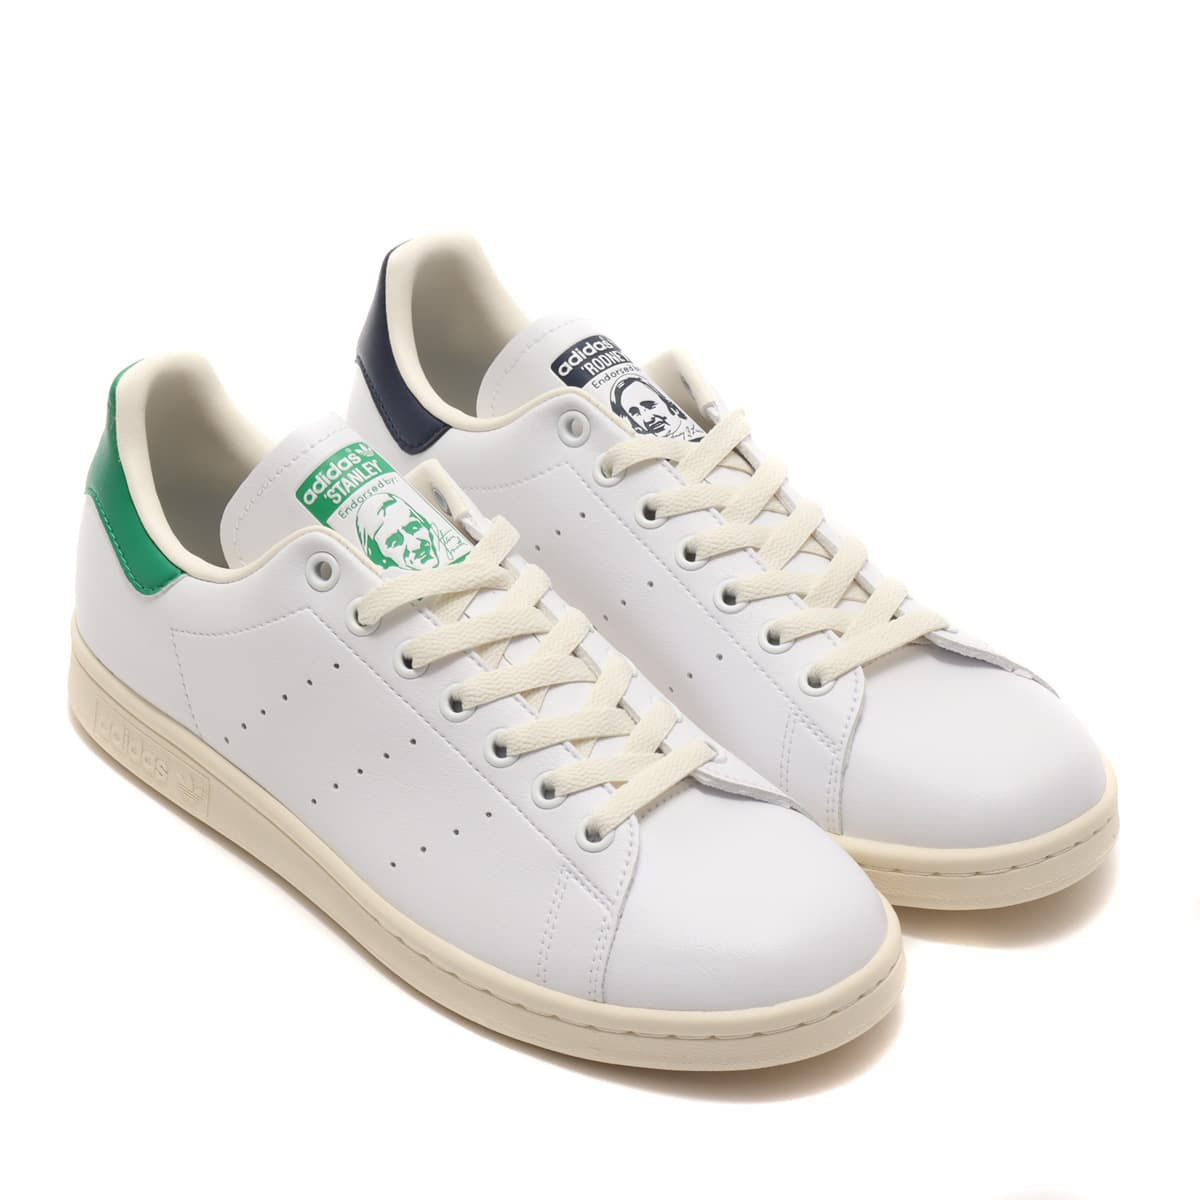 adidas STAN SMITH CREAM WHITE/FOOTWEAR WHITE/COLLEGE NAVY 21SS-I_photo_large